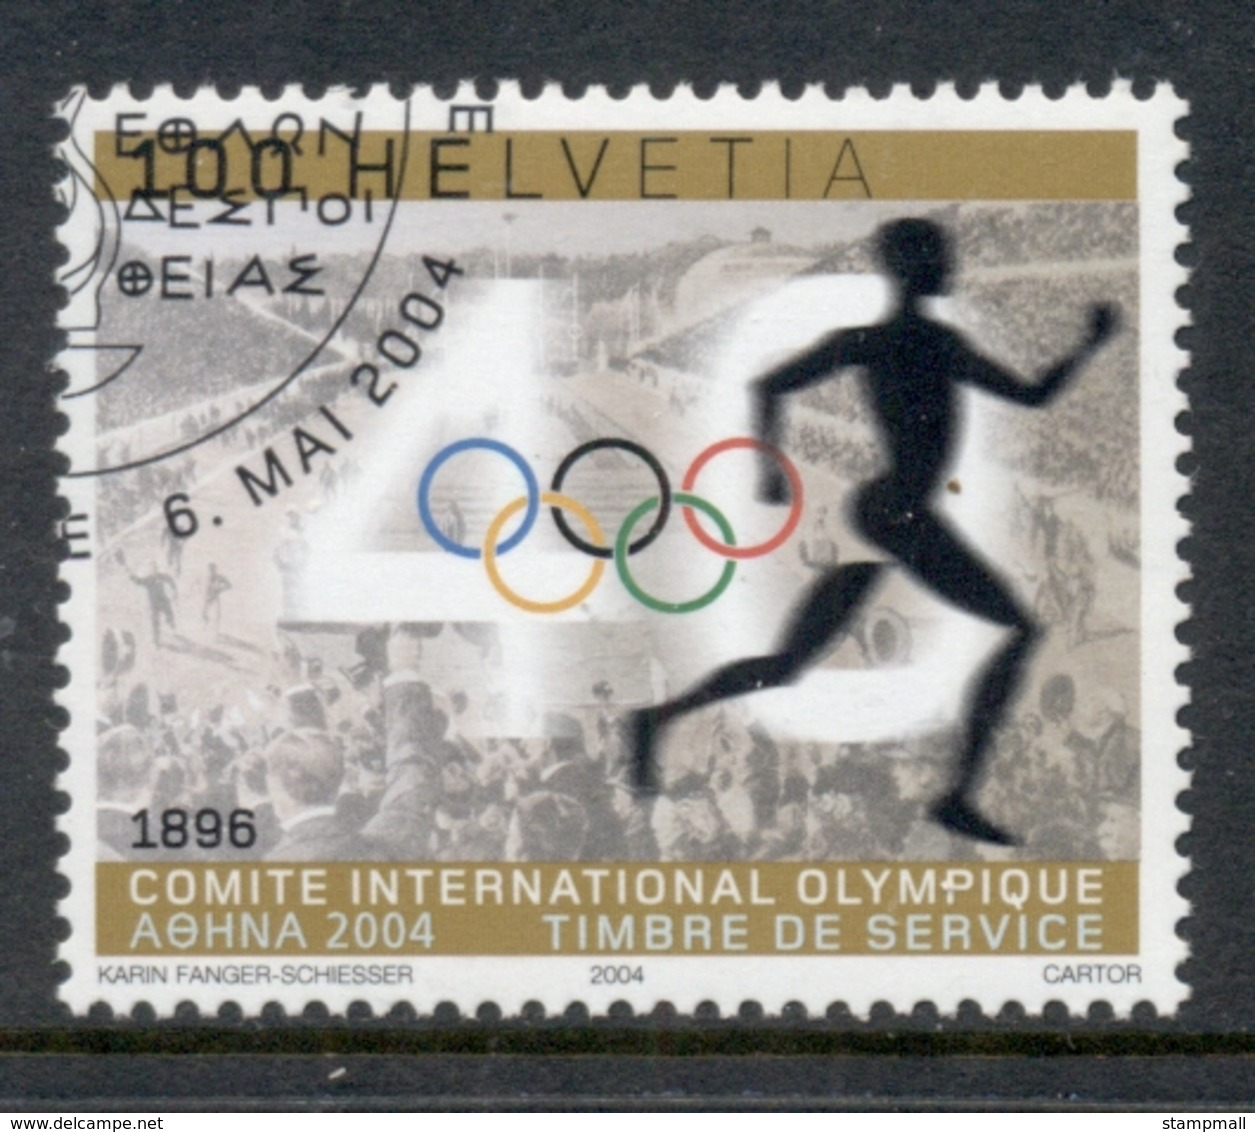 Switzerland 2004 Olympic Committee CTO - Zwitserland